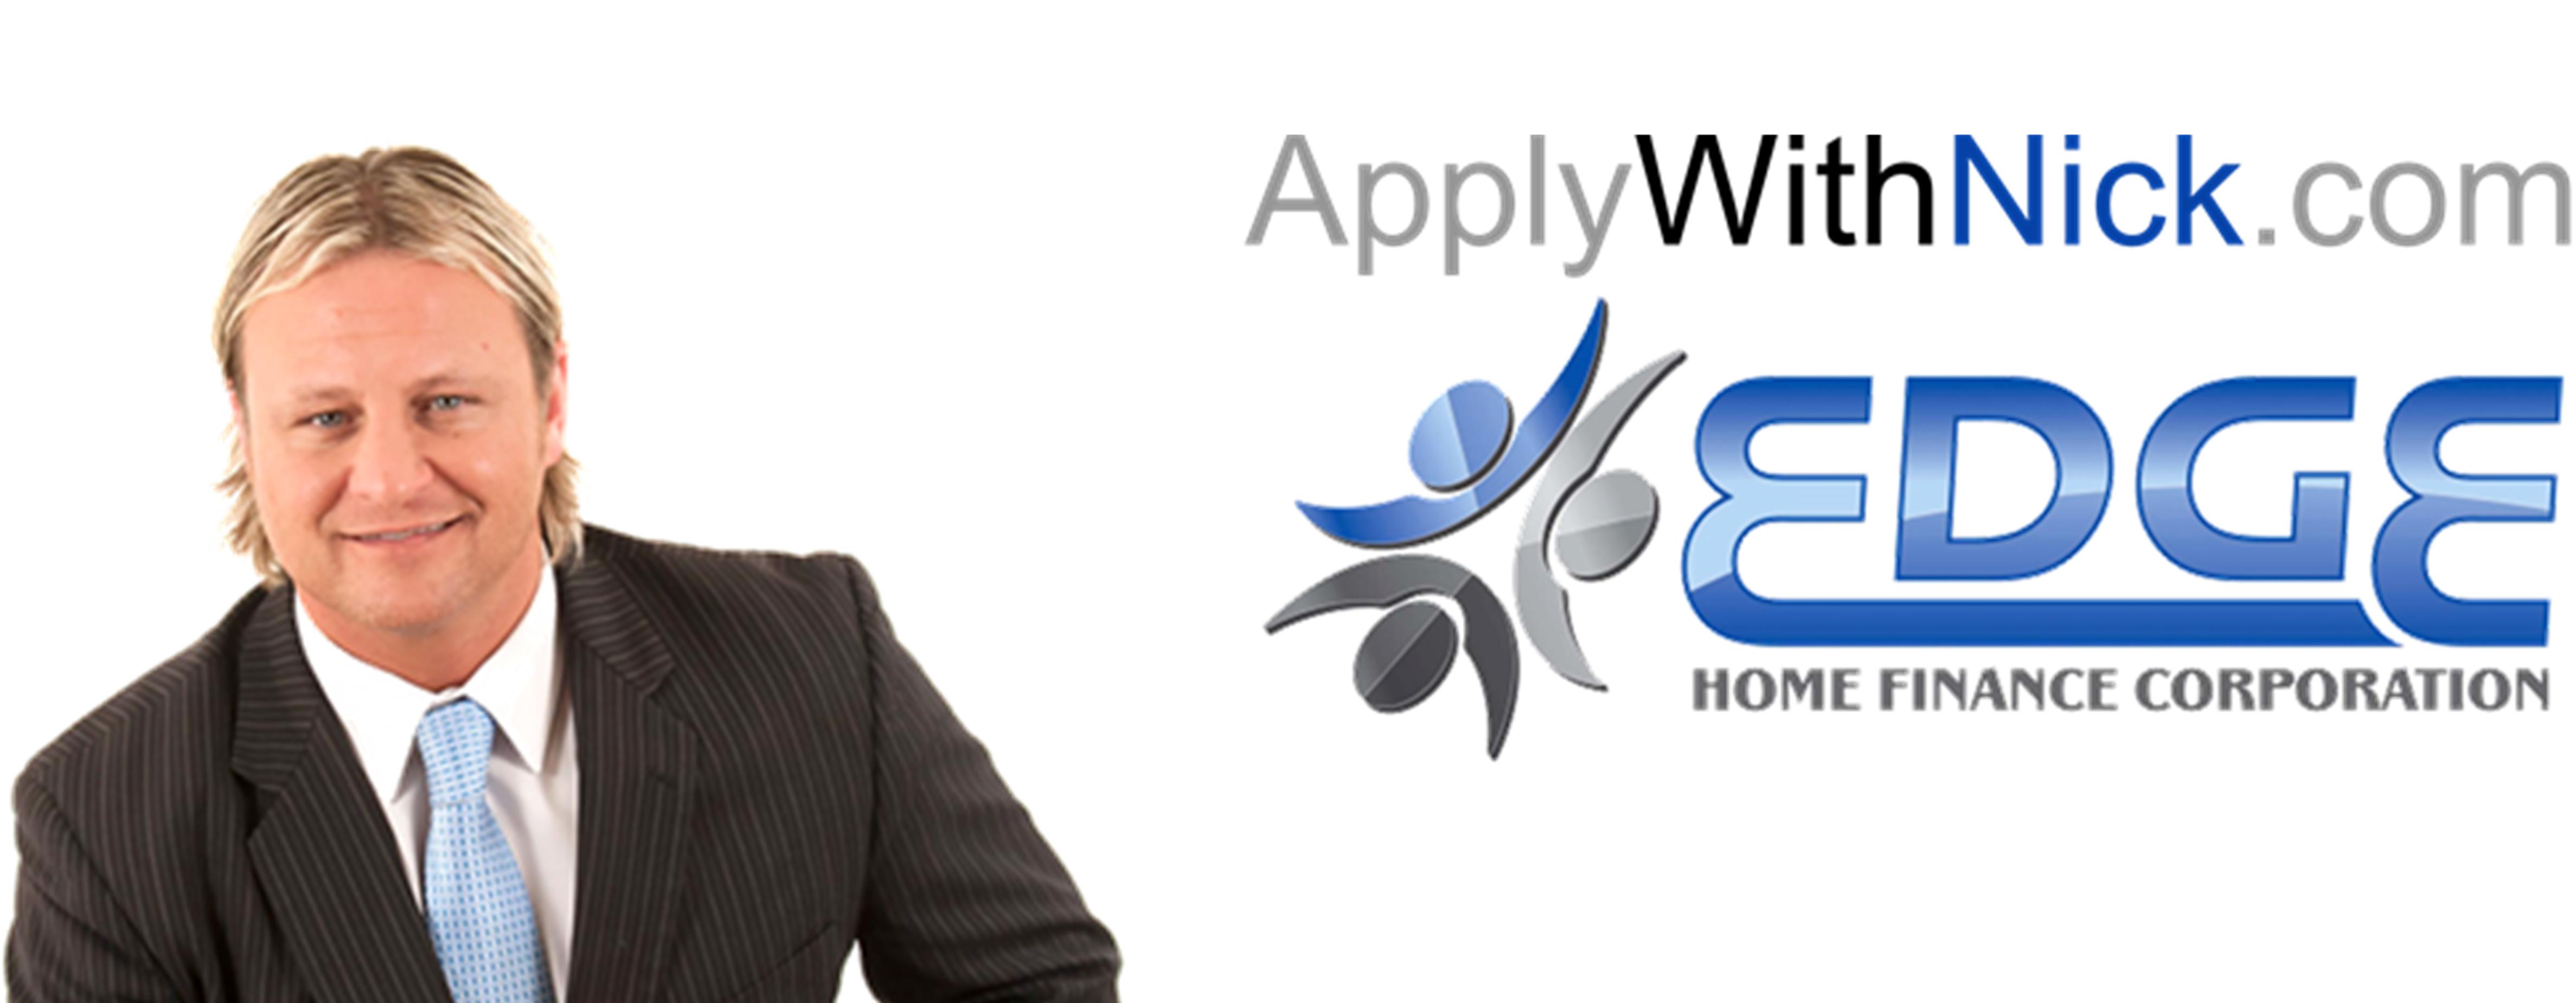 ApplyWithNick Logo